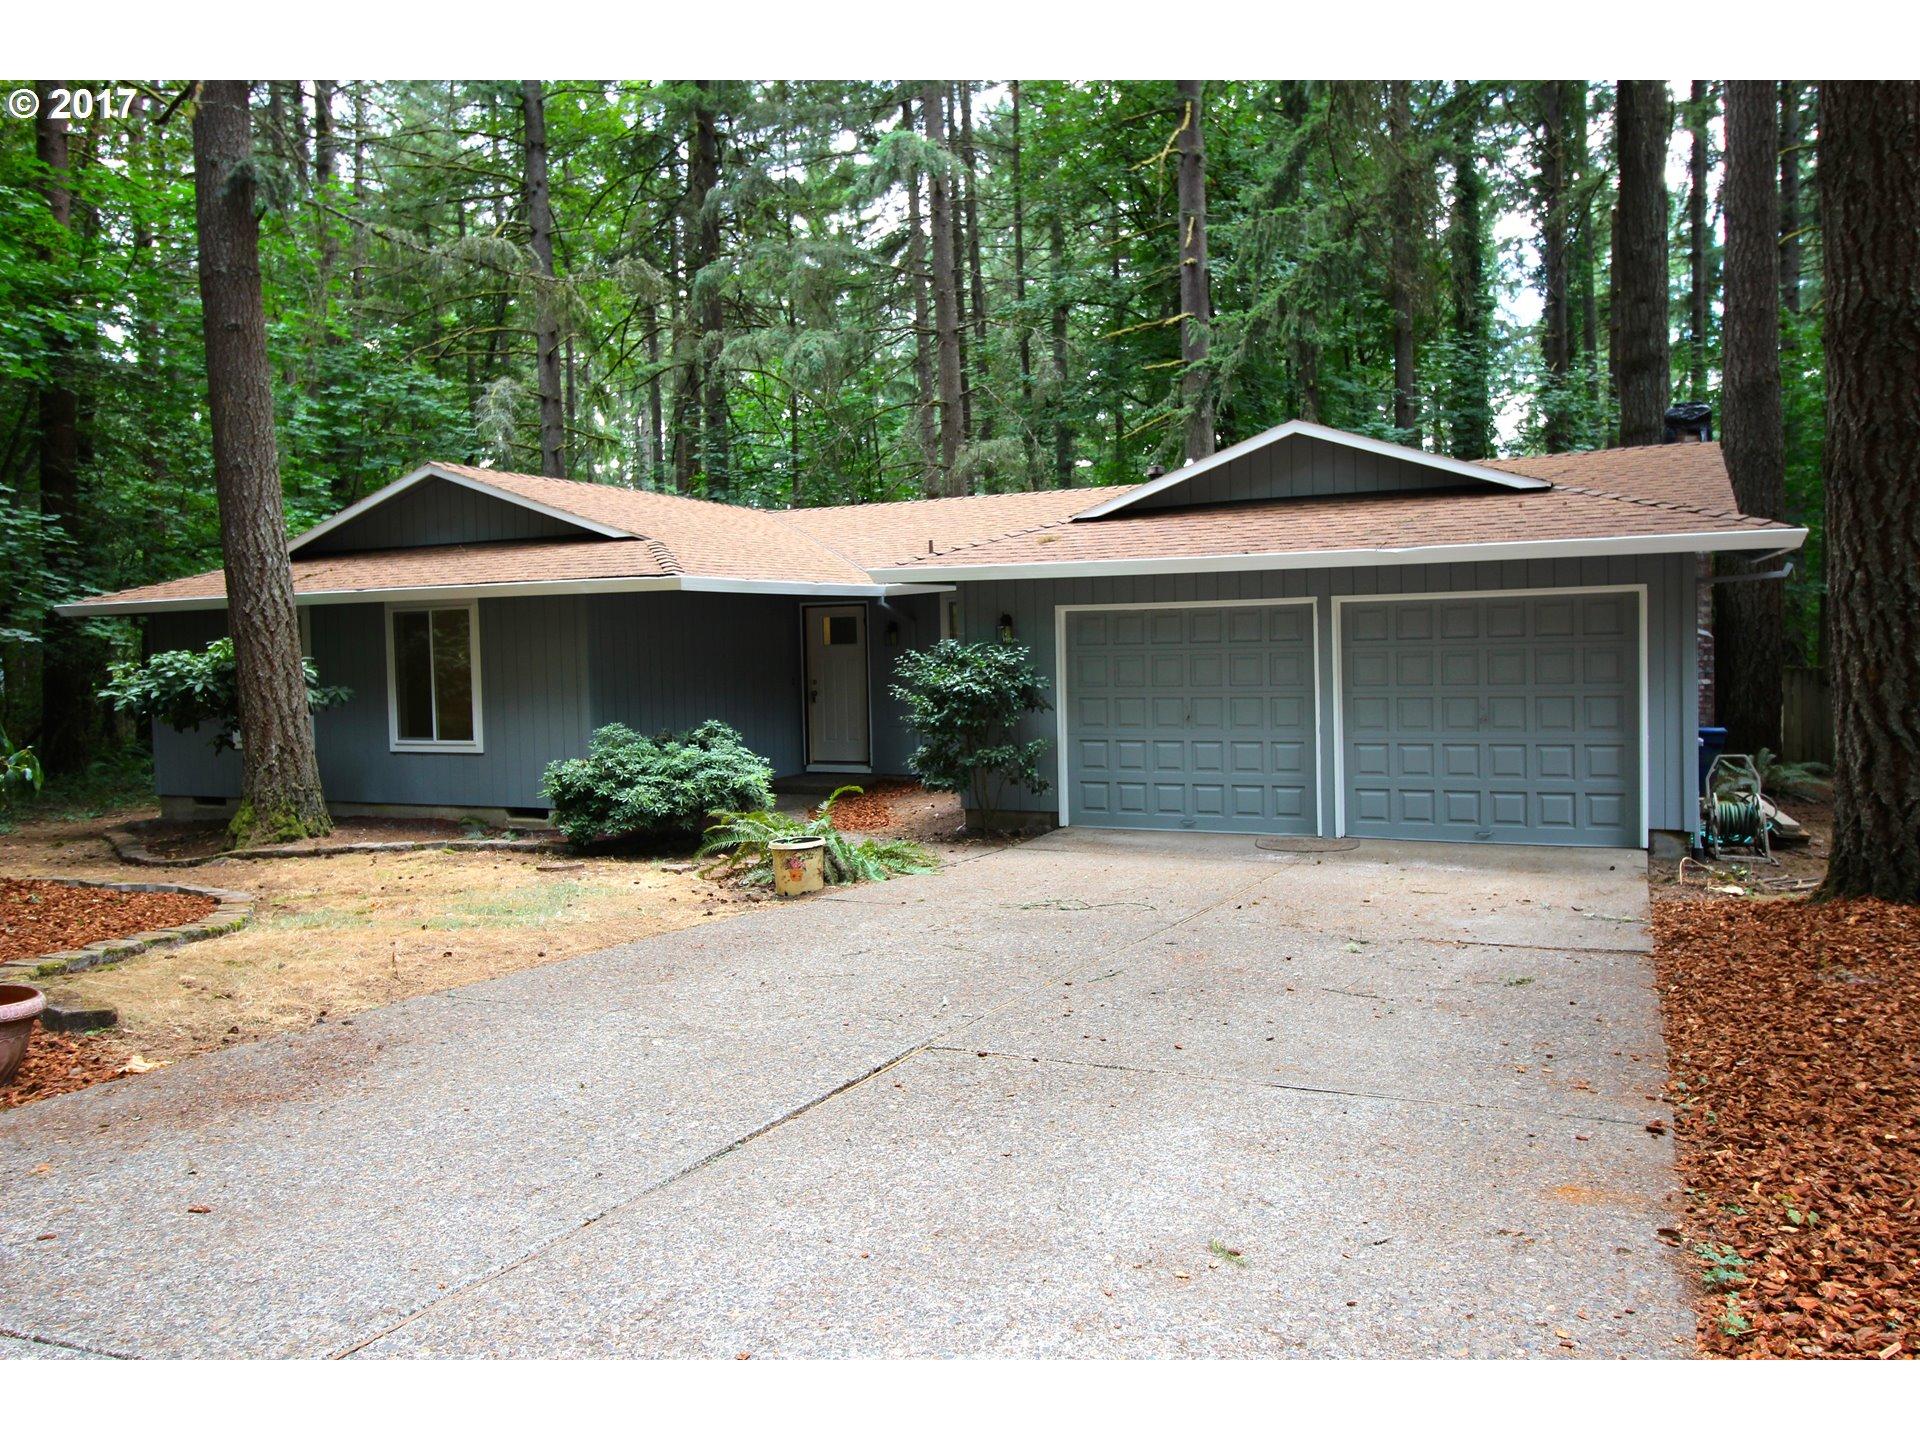 21125 S CASCA BERRY CT, Oregon City OR 97045